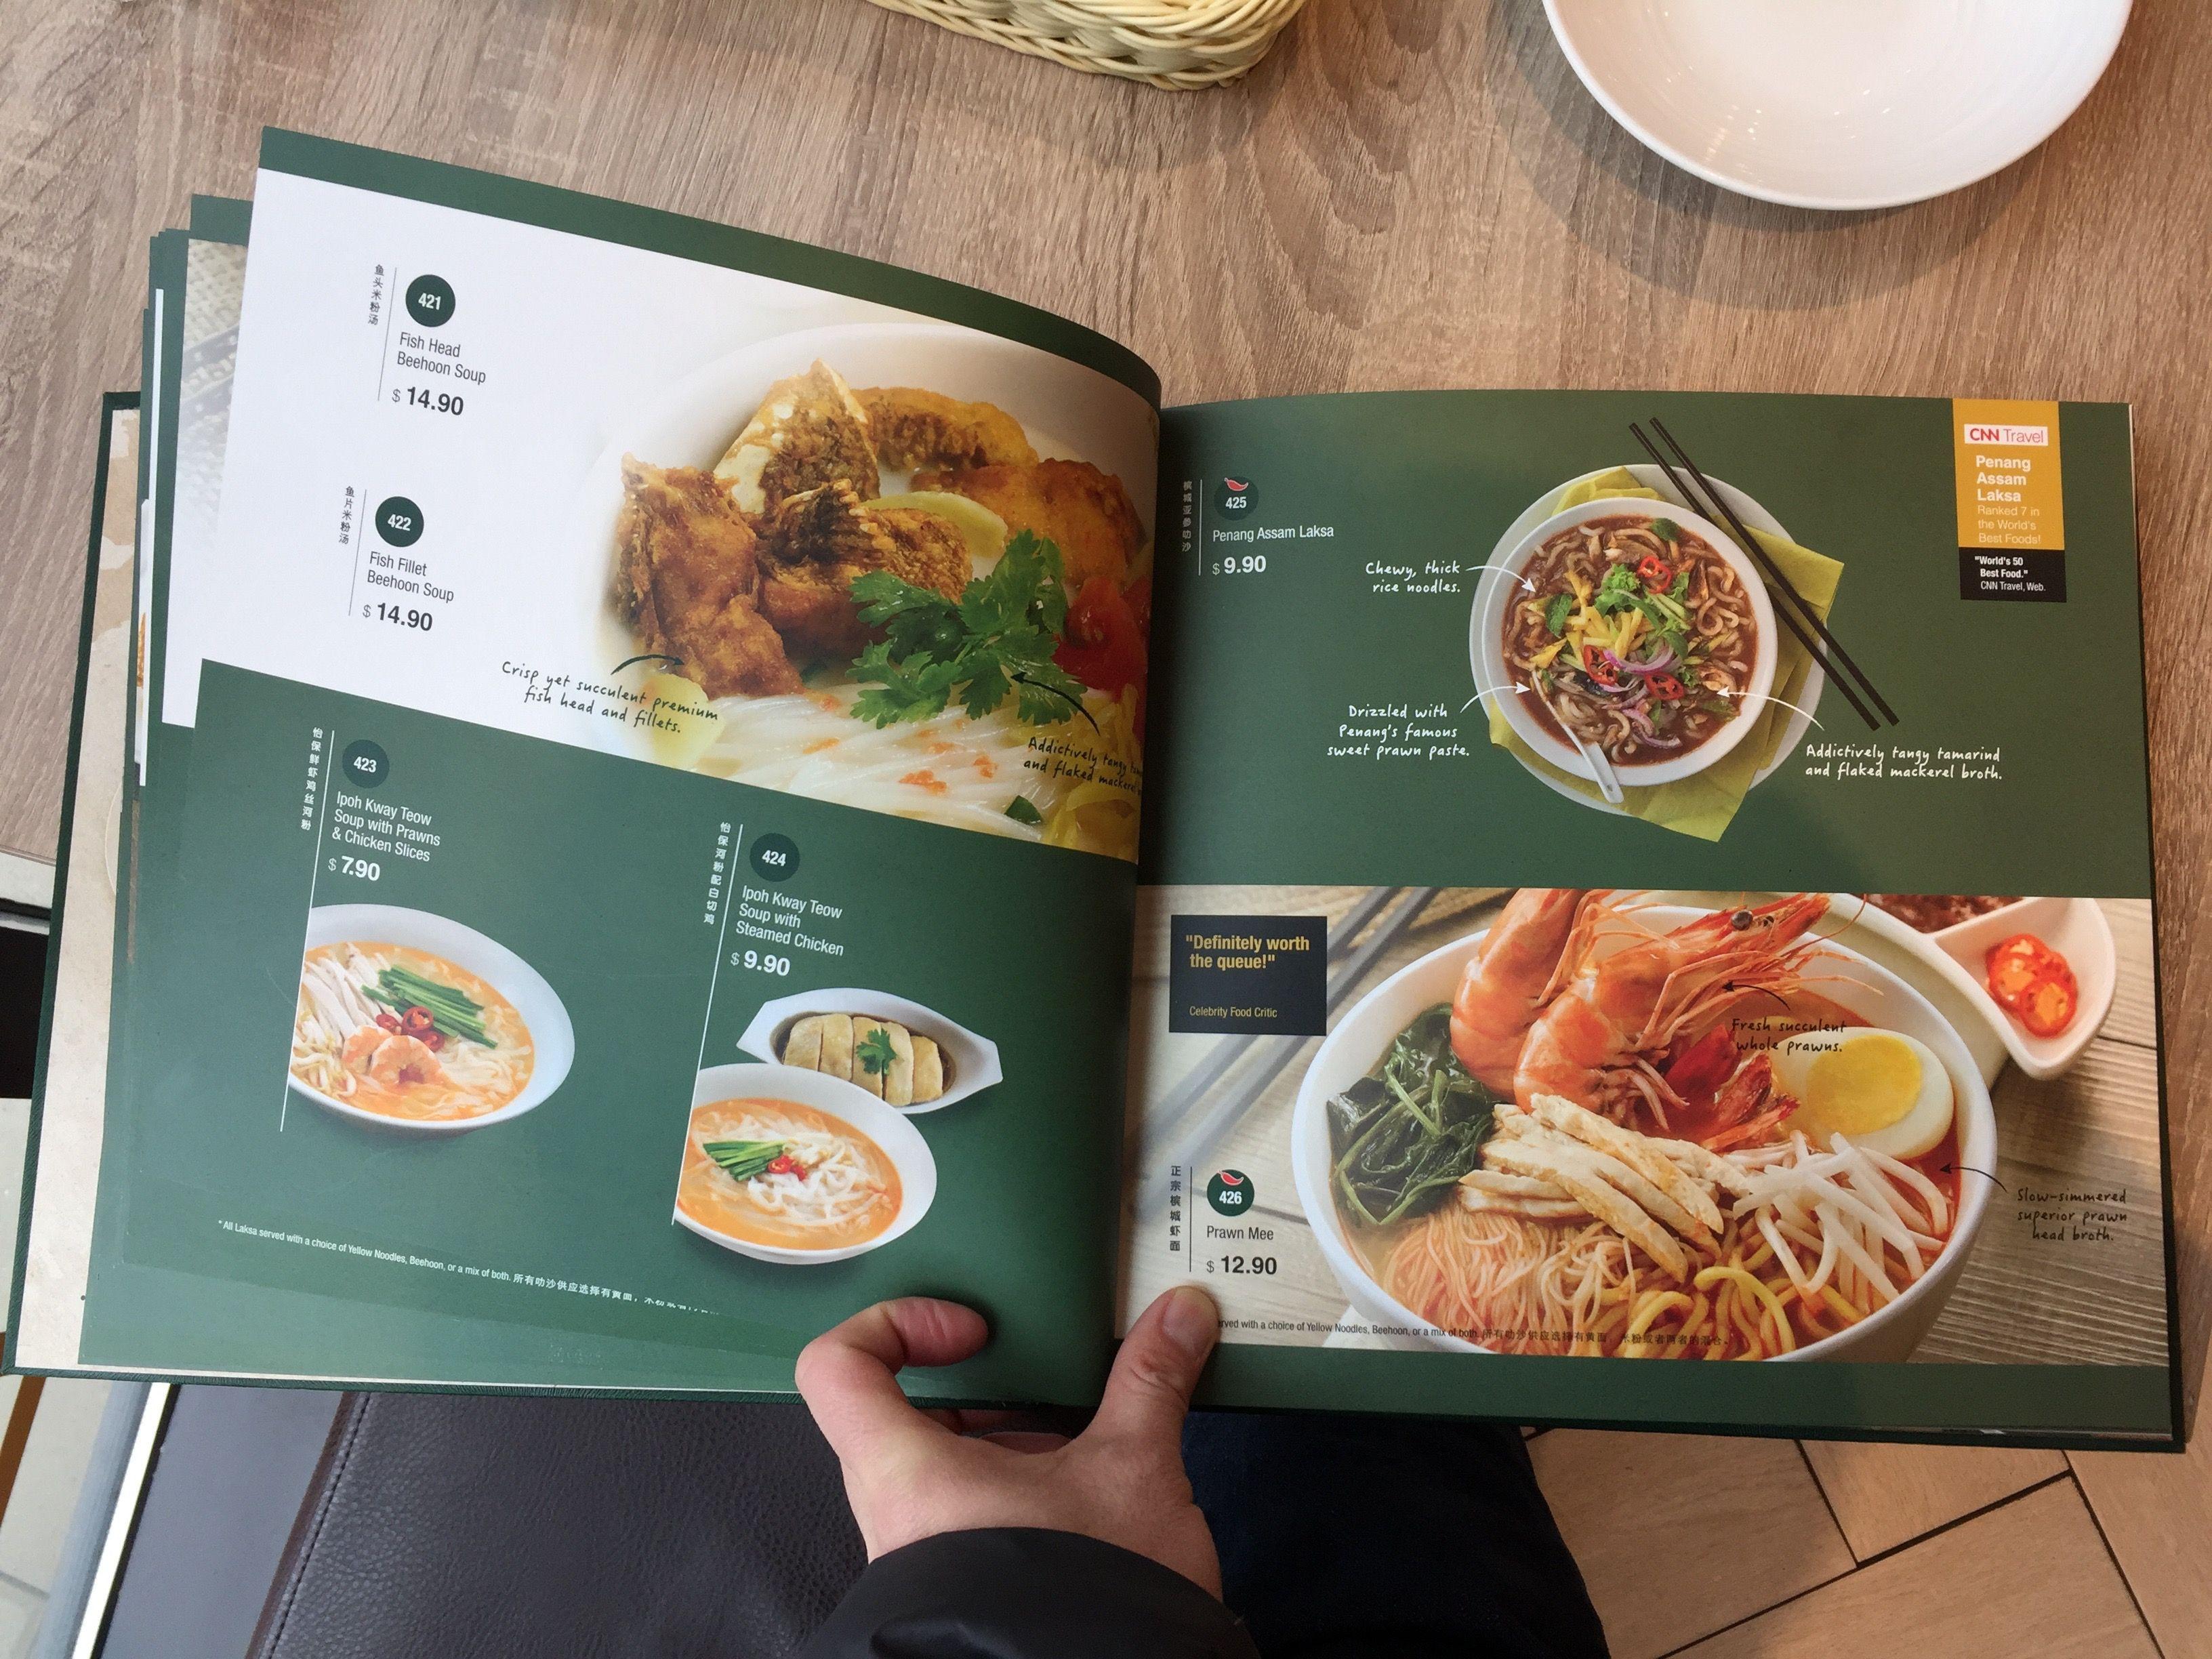 Papparich Malaysian Cuisine Flushing Ny Malaysian Cuisine Menu Restaurant Cuisine